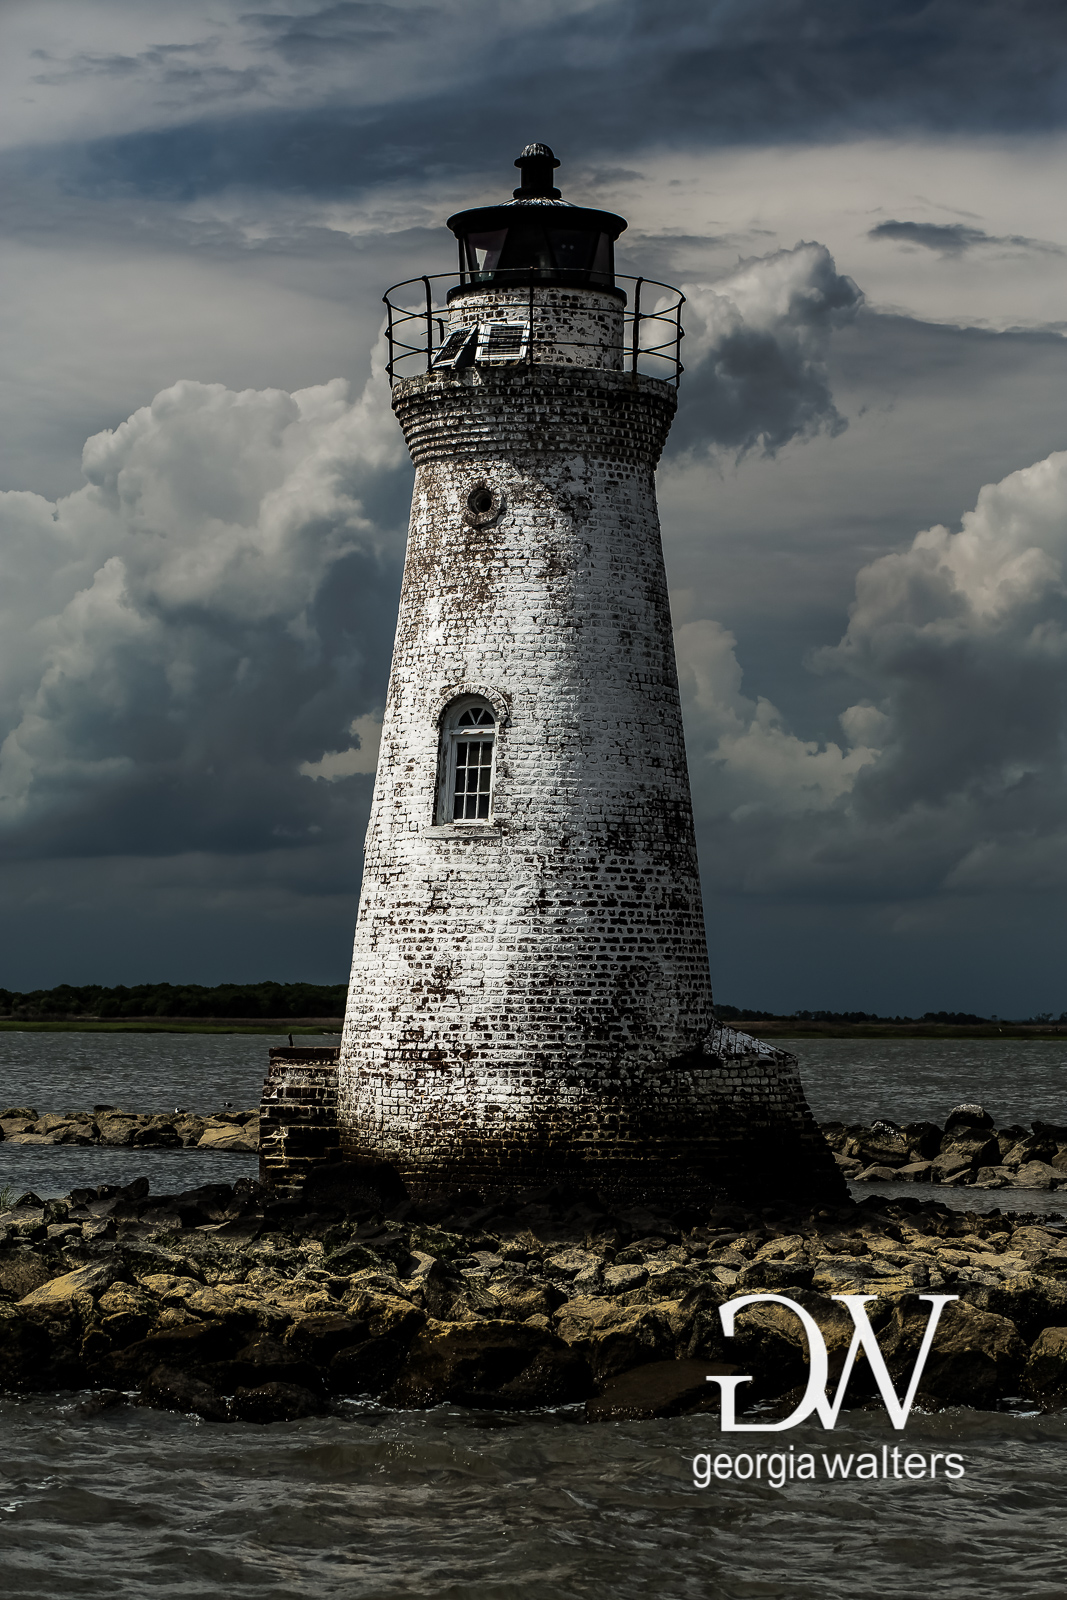 A storm brews behind the Cockspur Lighthouse.